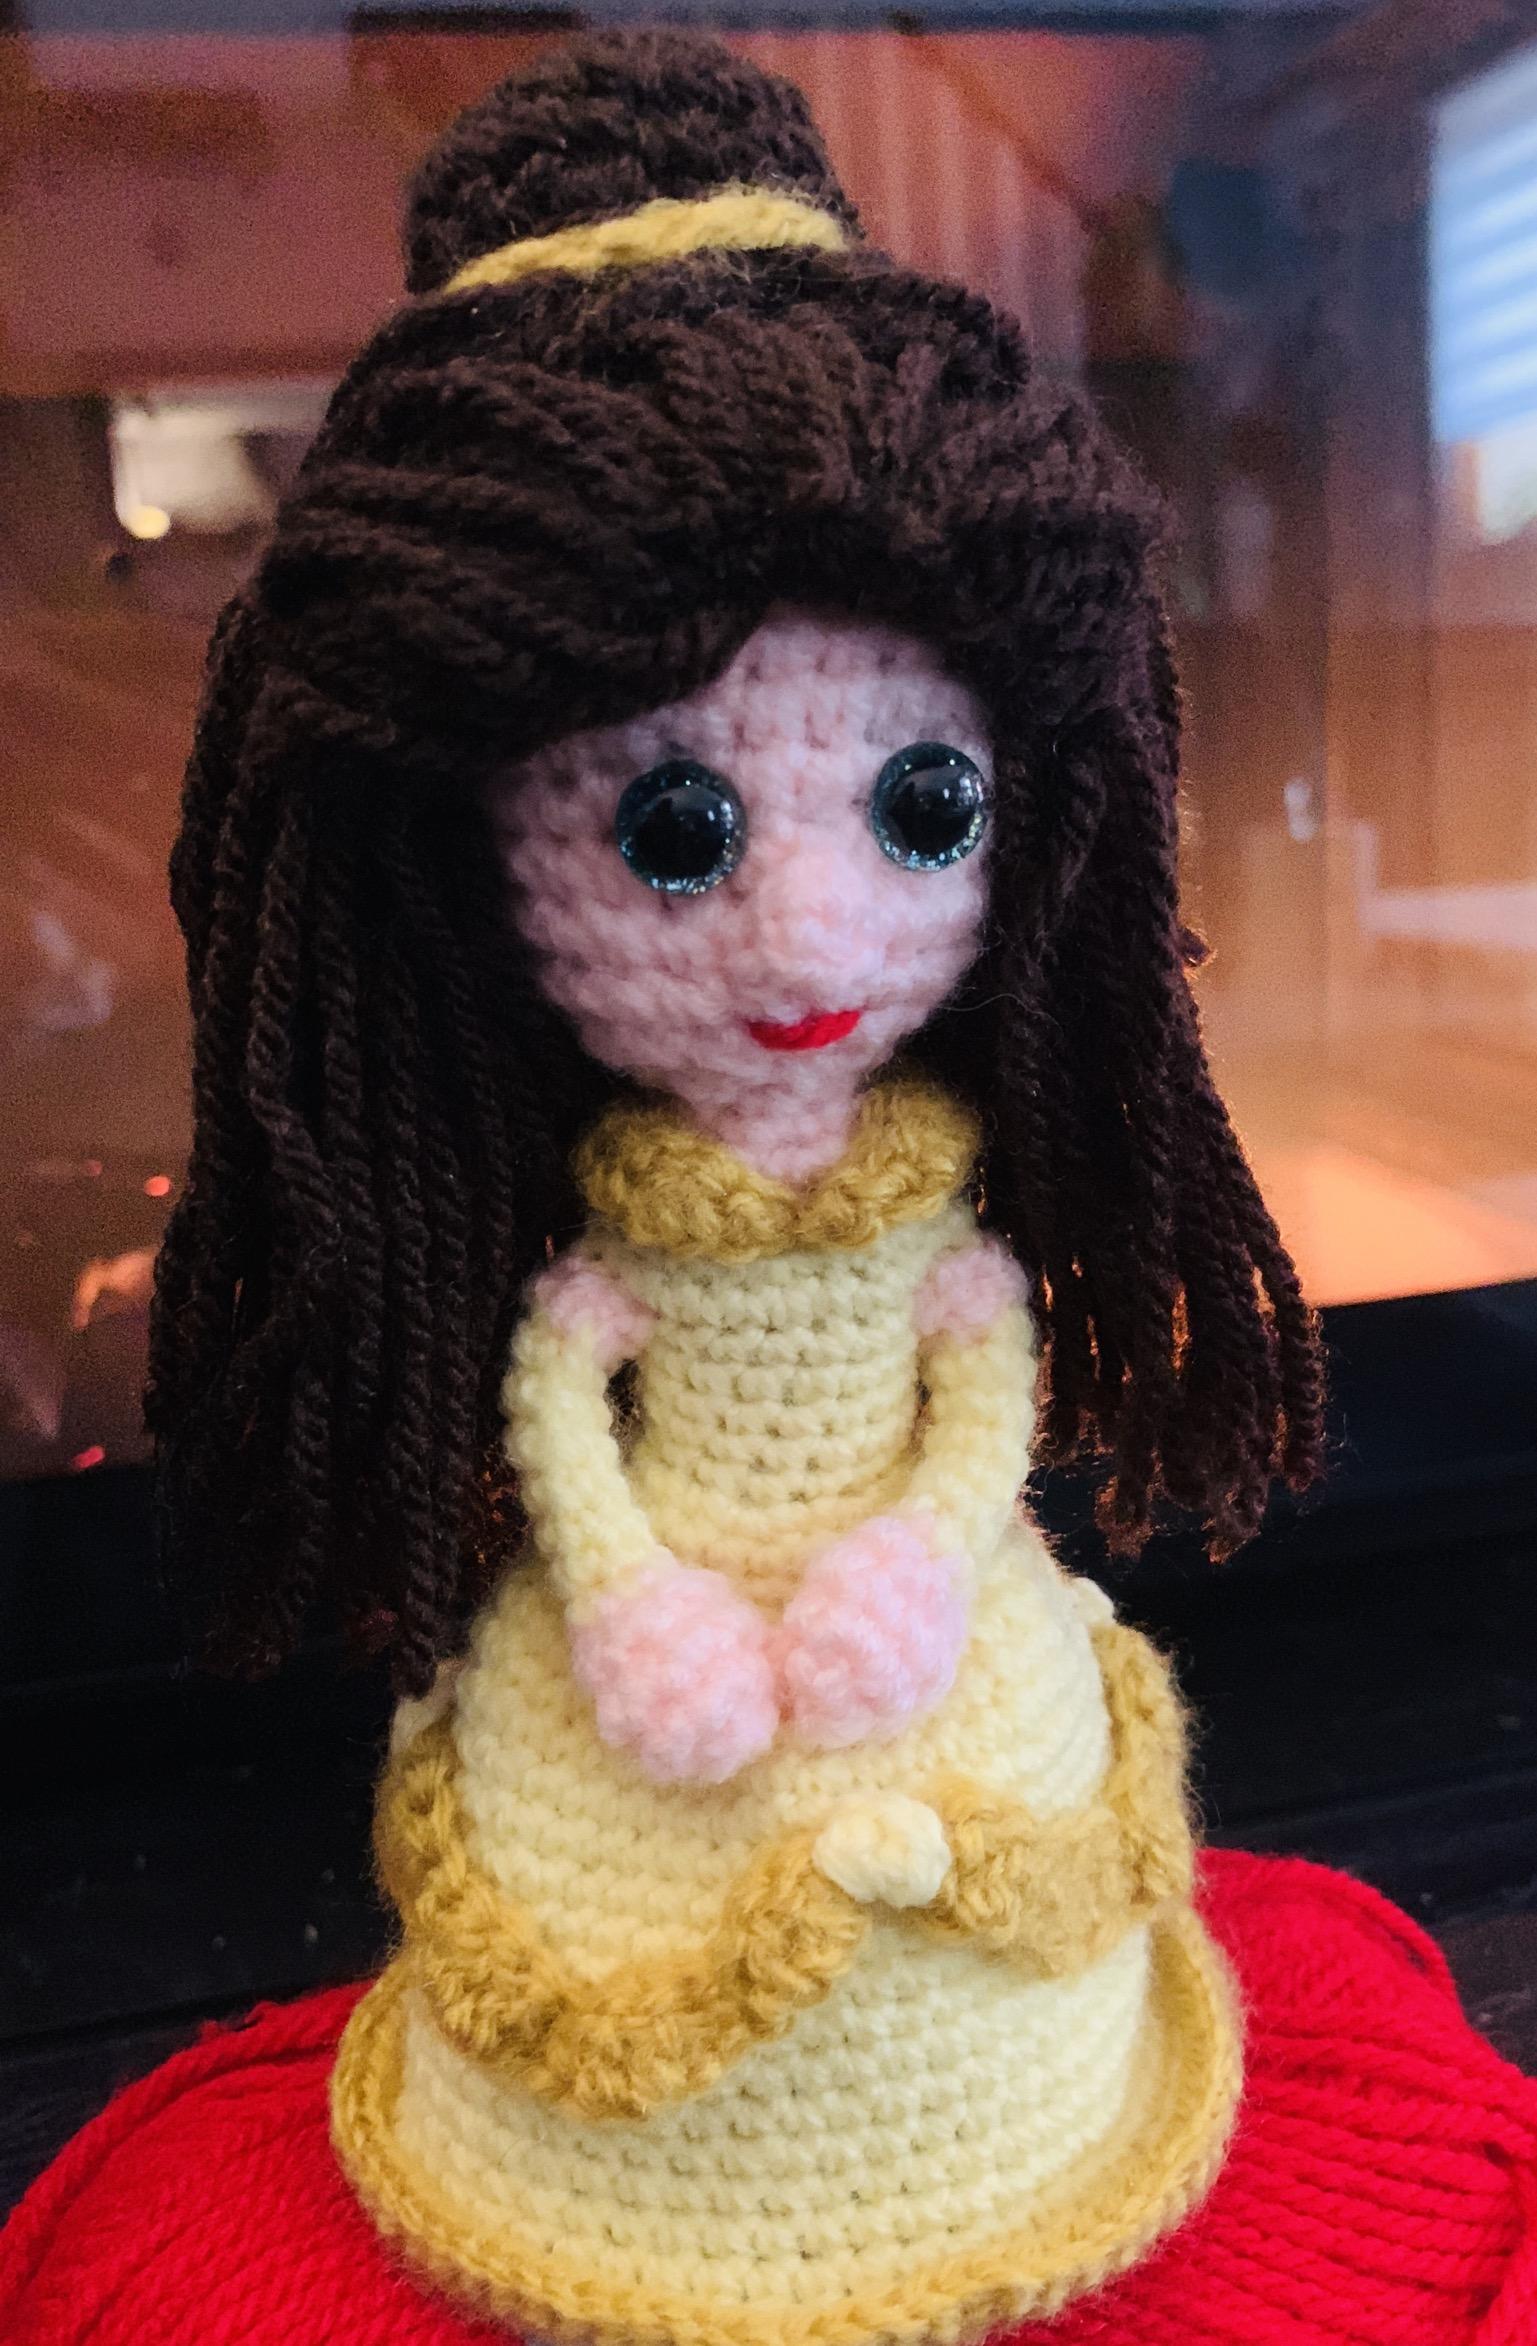 Tuto PDF Belle crochet